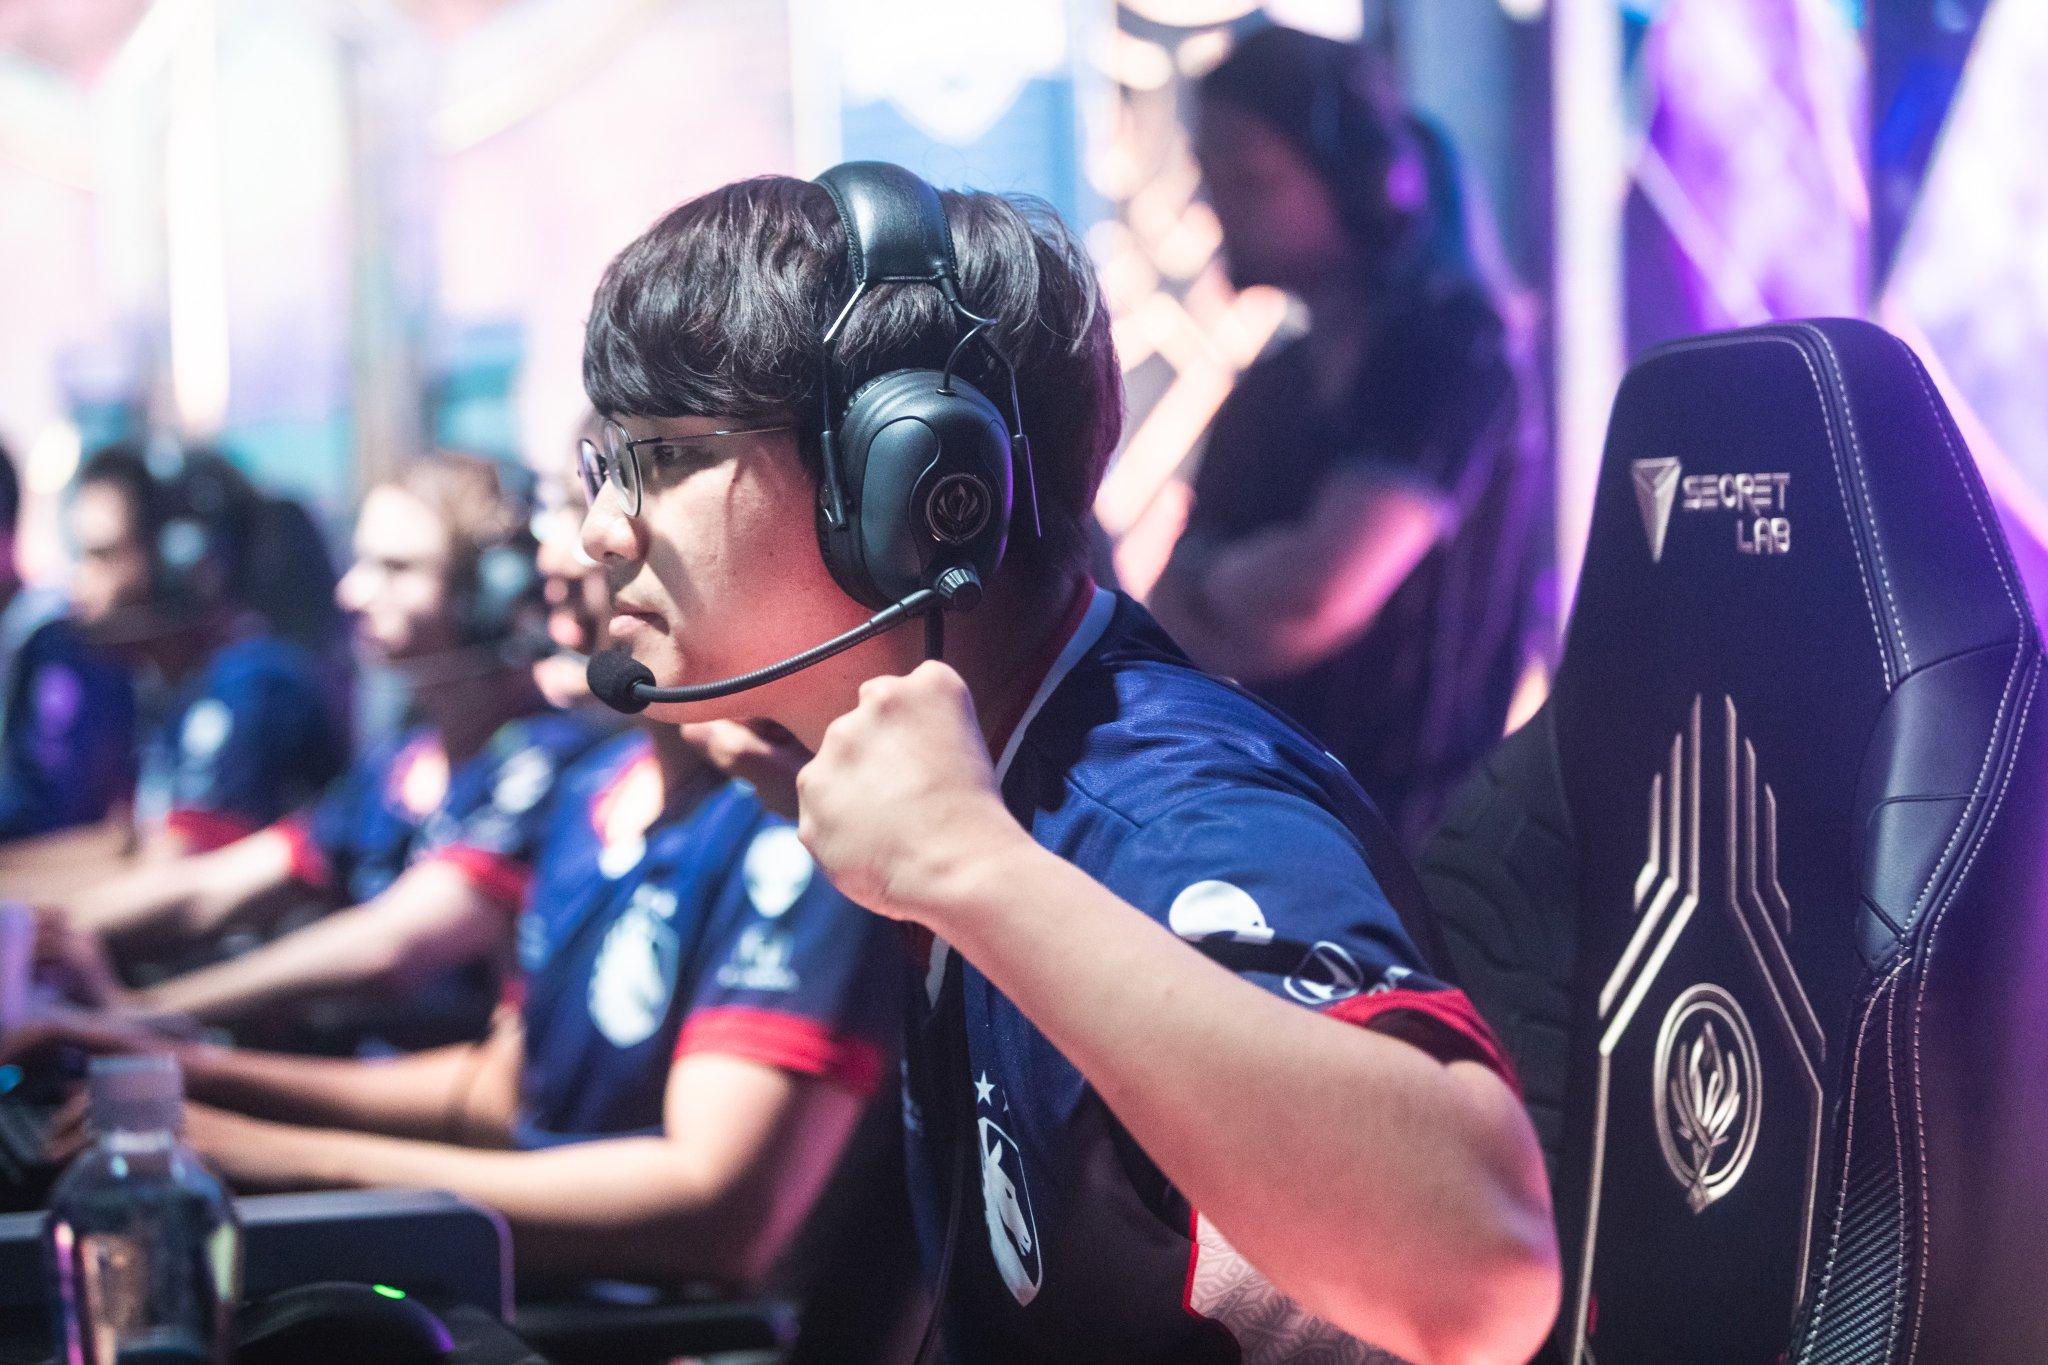 Team Liquid takes down Invictus Gaming at LoL MSI 2019